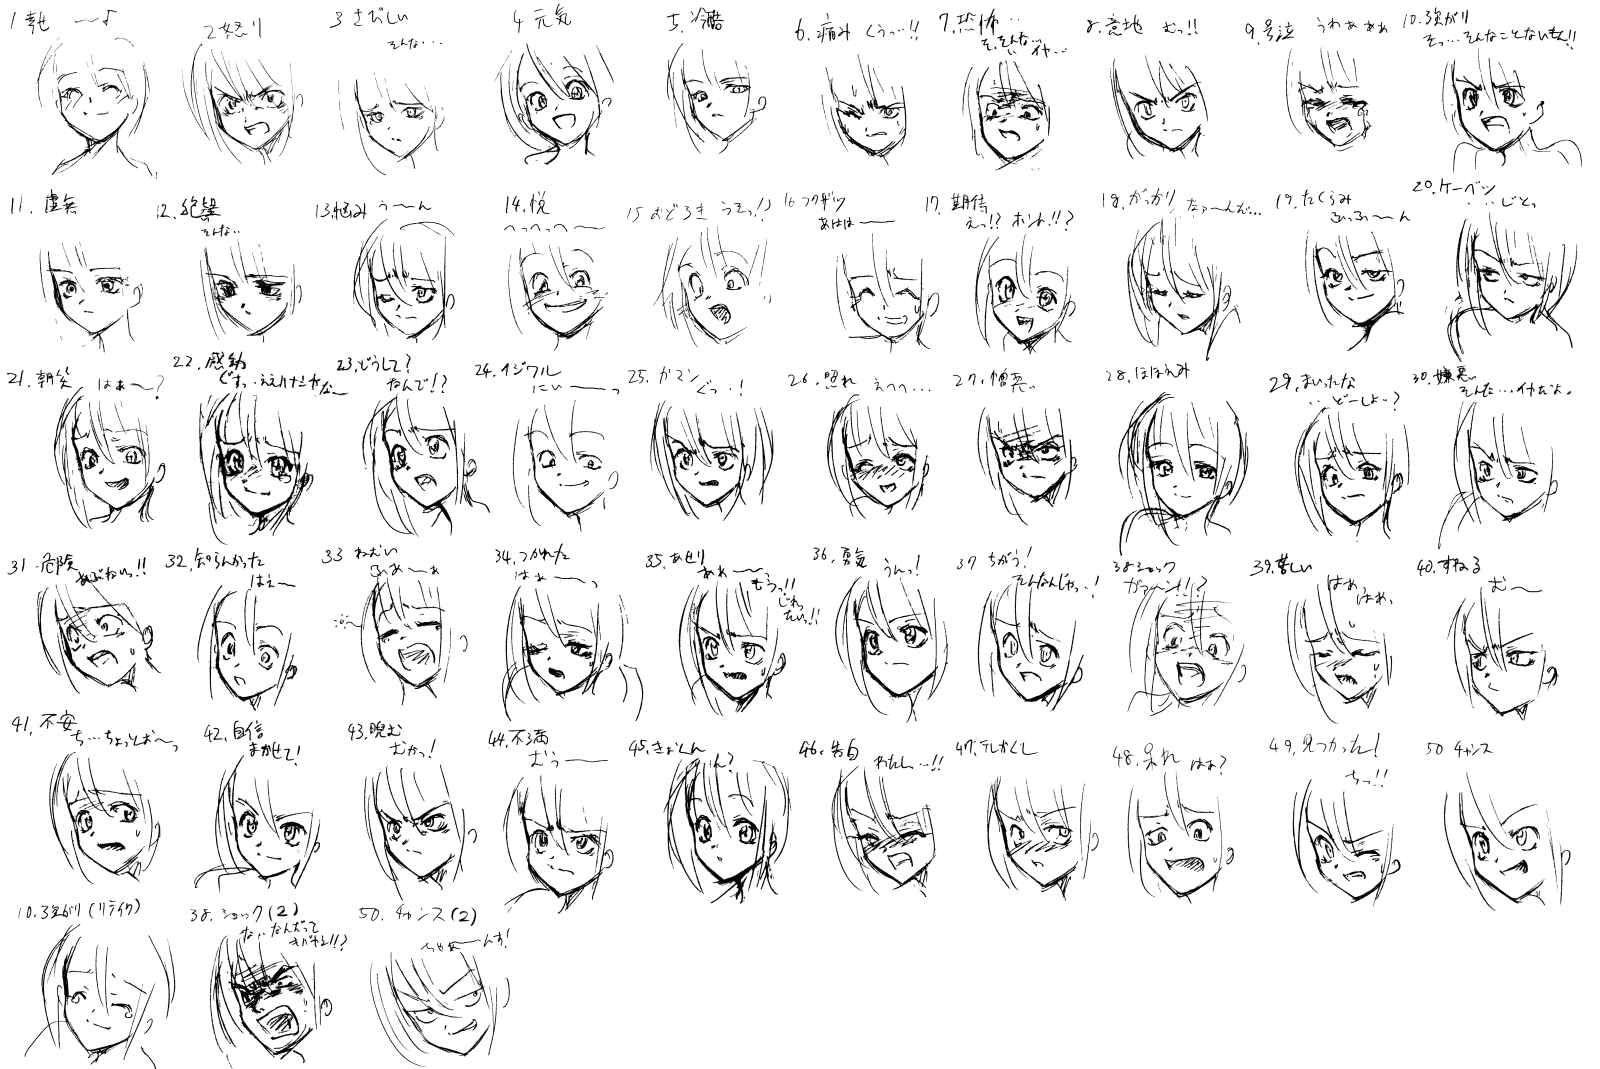 50 Expressions Anime By Bardi3l Deviantart Com On Deviantart